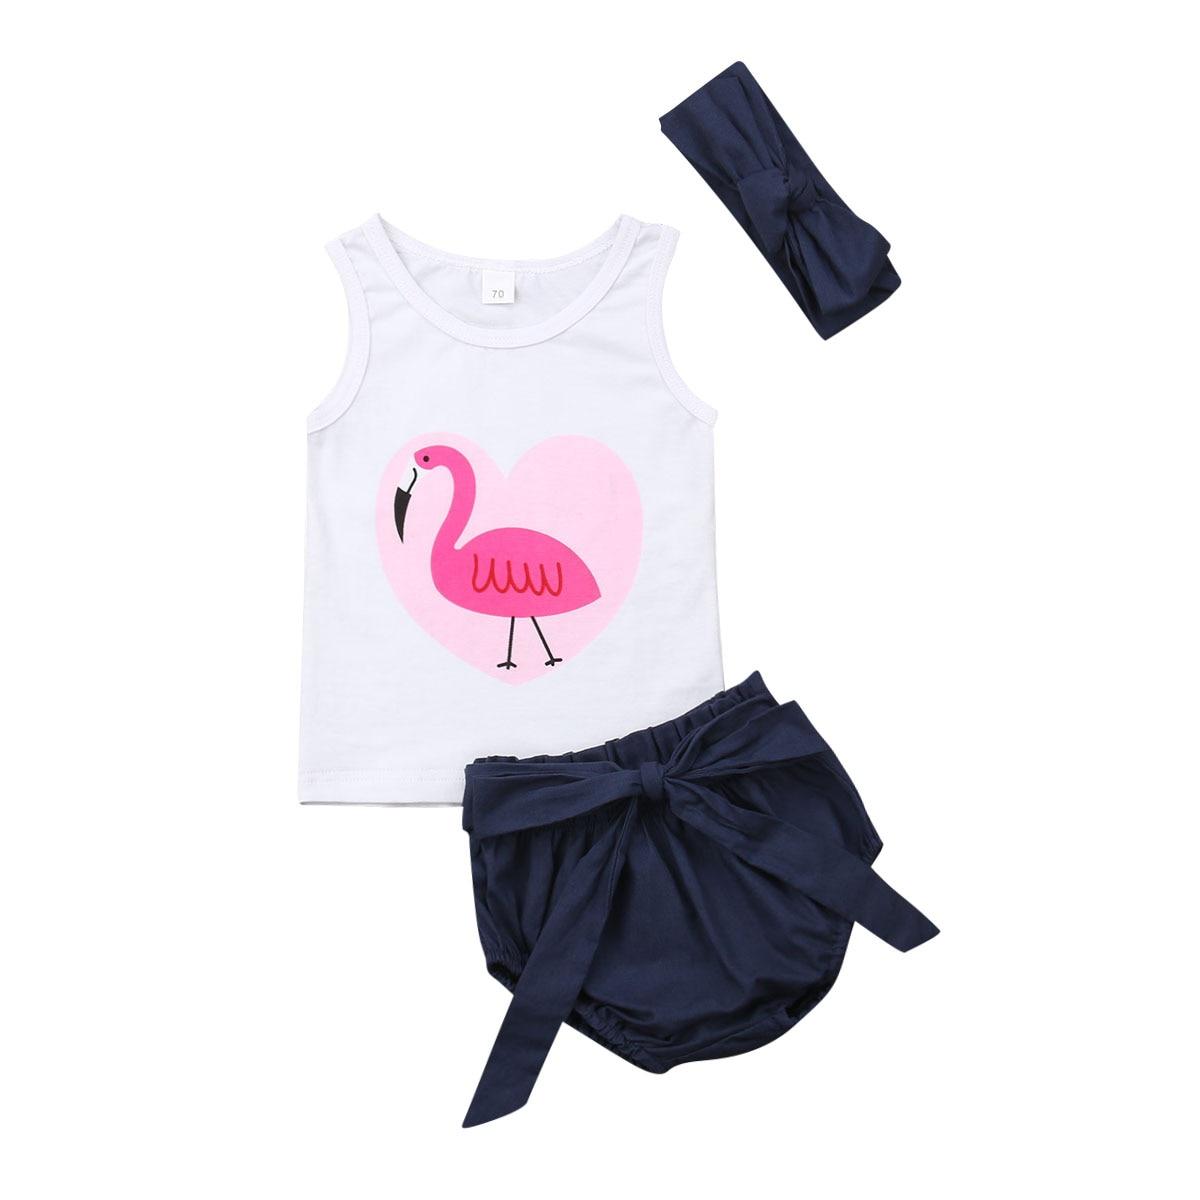 0-24 M Nette Neugeborene Baby Mädchen Ärmellose Flamingo Weste Tops Bowknot Shorts Baby Pumphose Stirnband 3 Pcs Outfits Baby Mädchen Kleidung